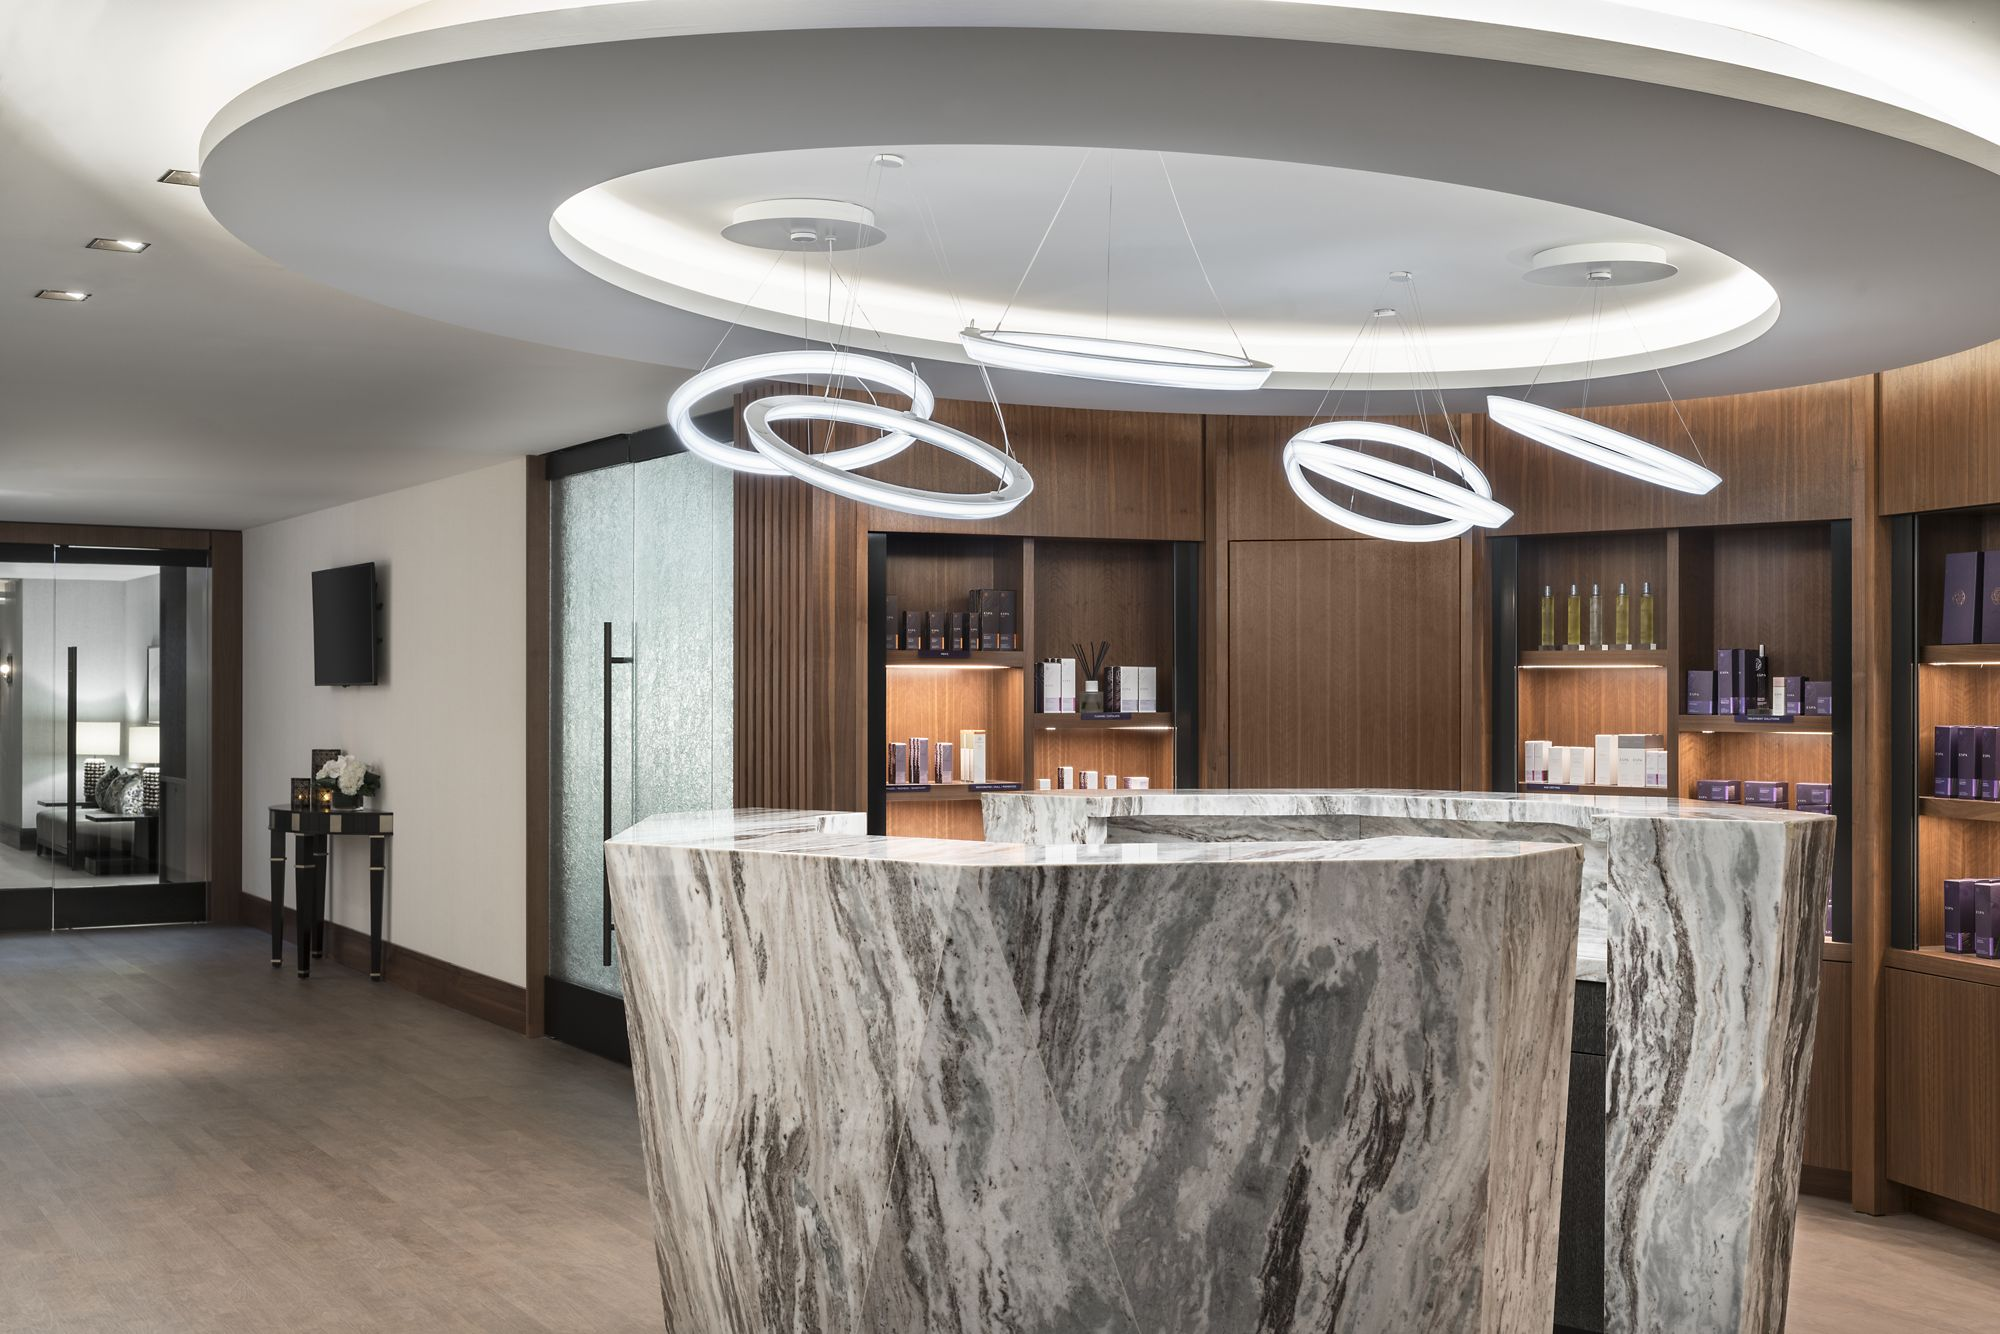 The Ritz-Carlton, Chicago image 6